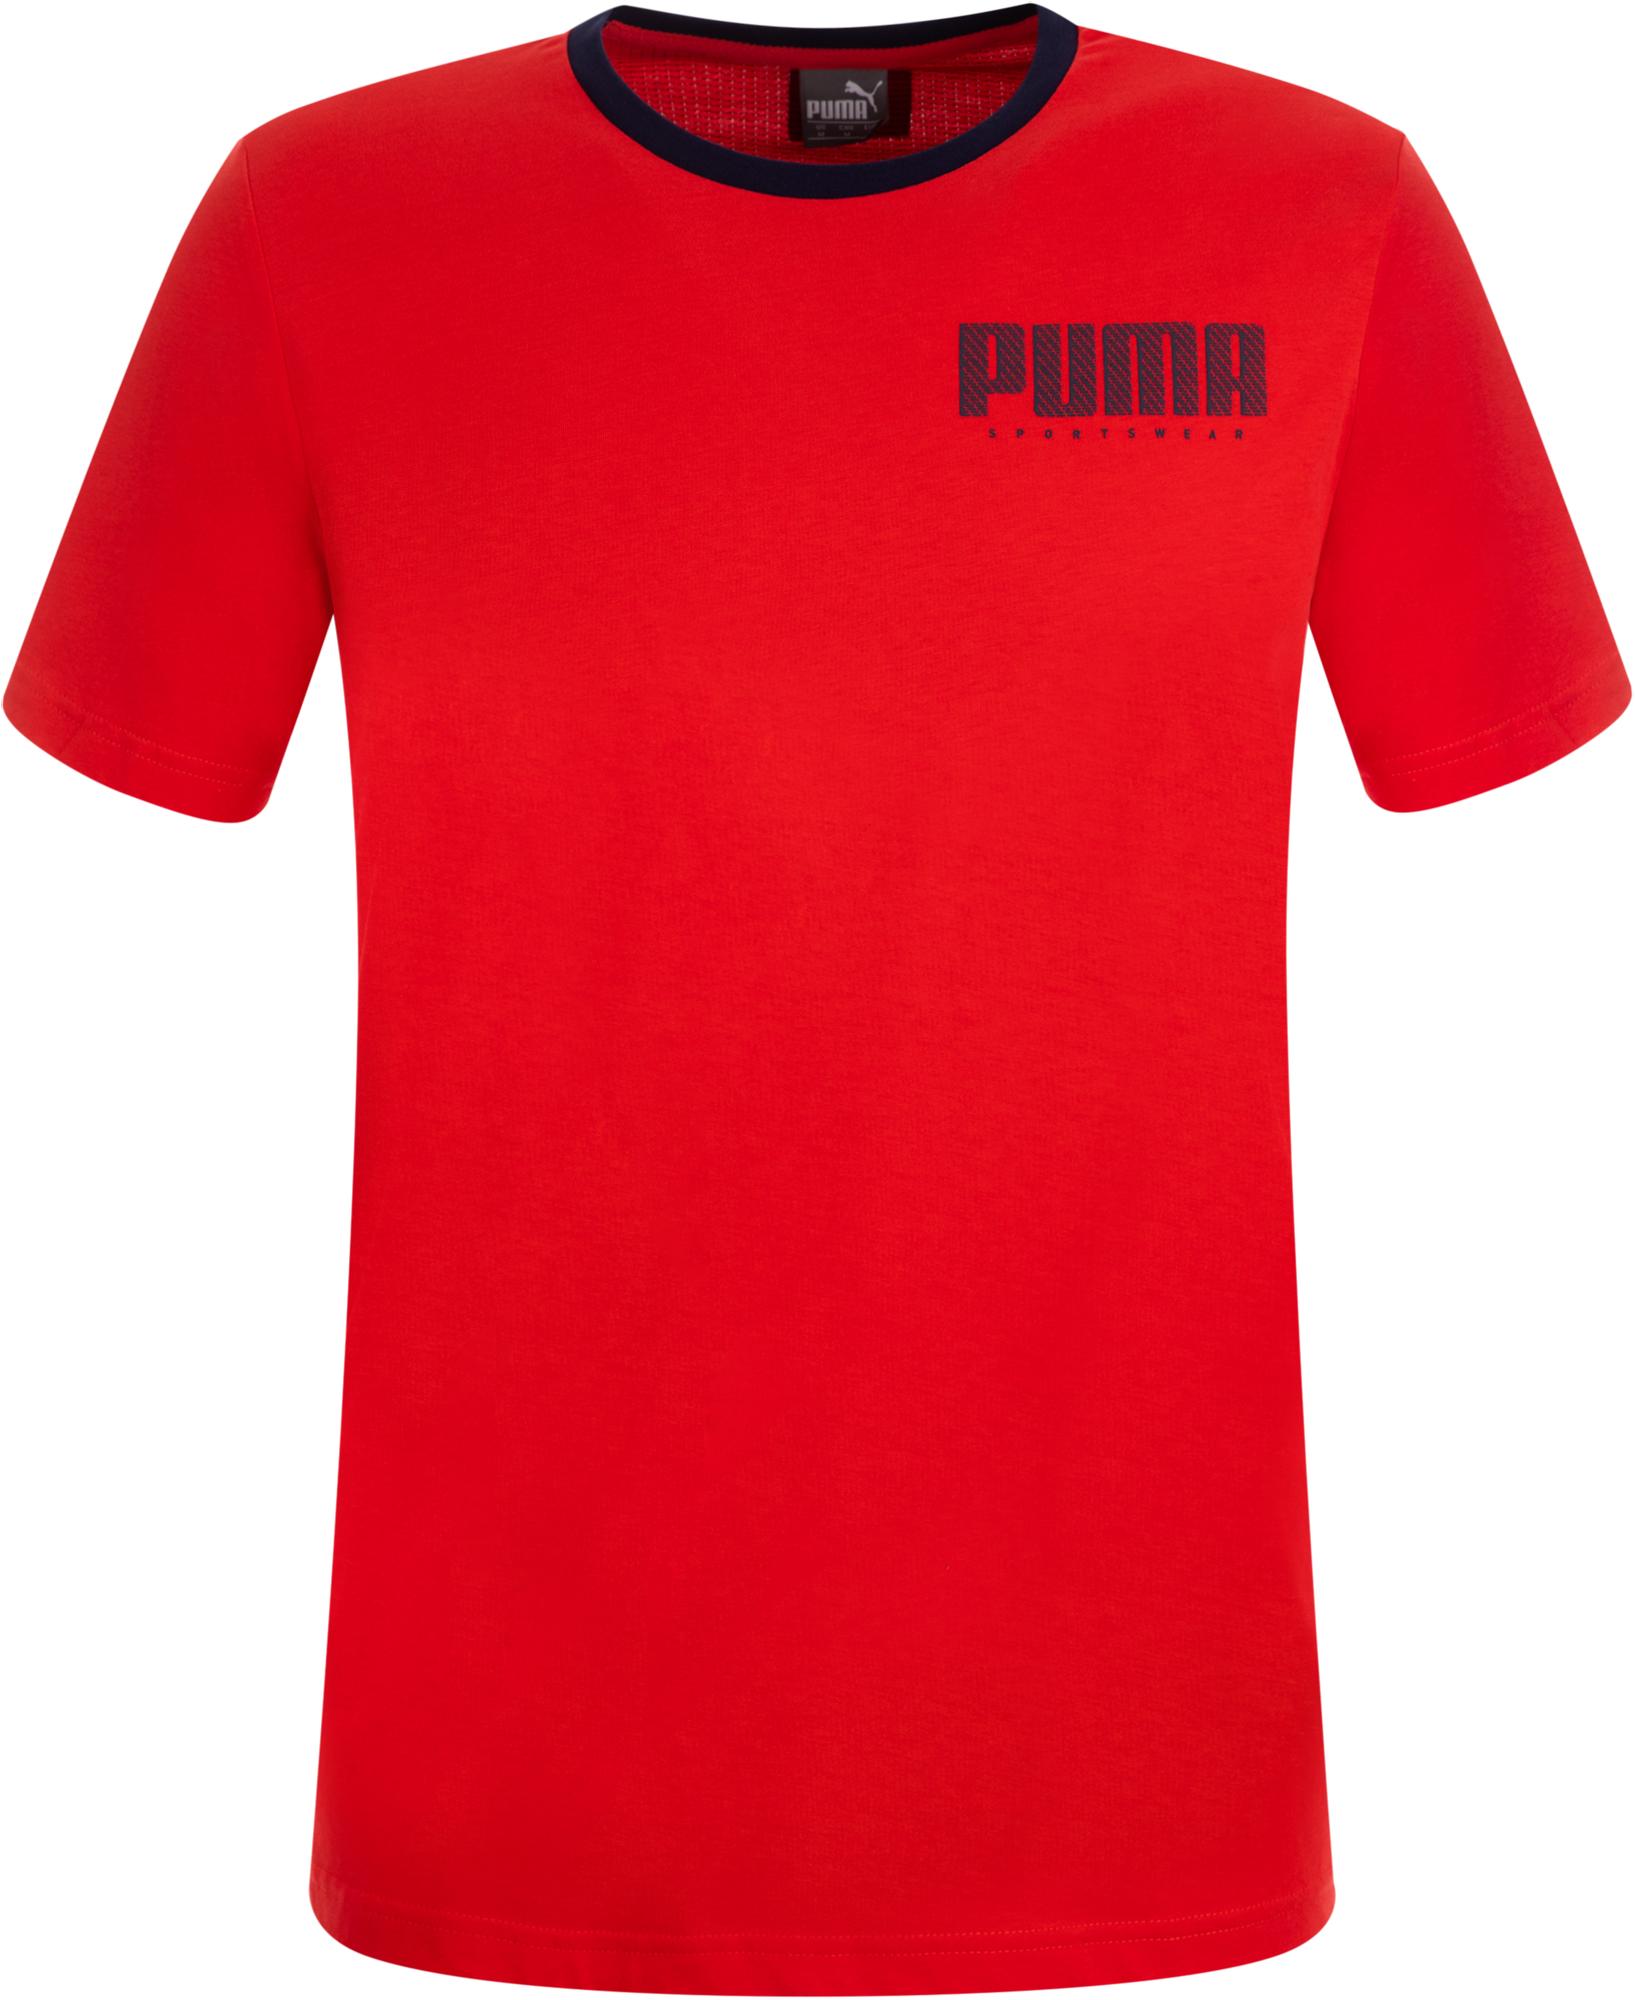 Puma Футболка мужская Puma Athletics Elevated, размер 48-50